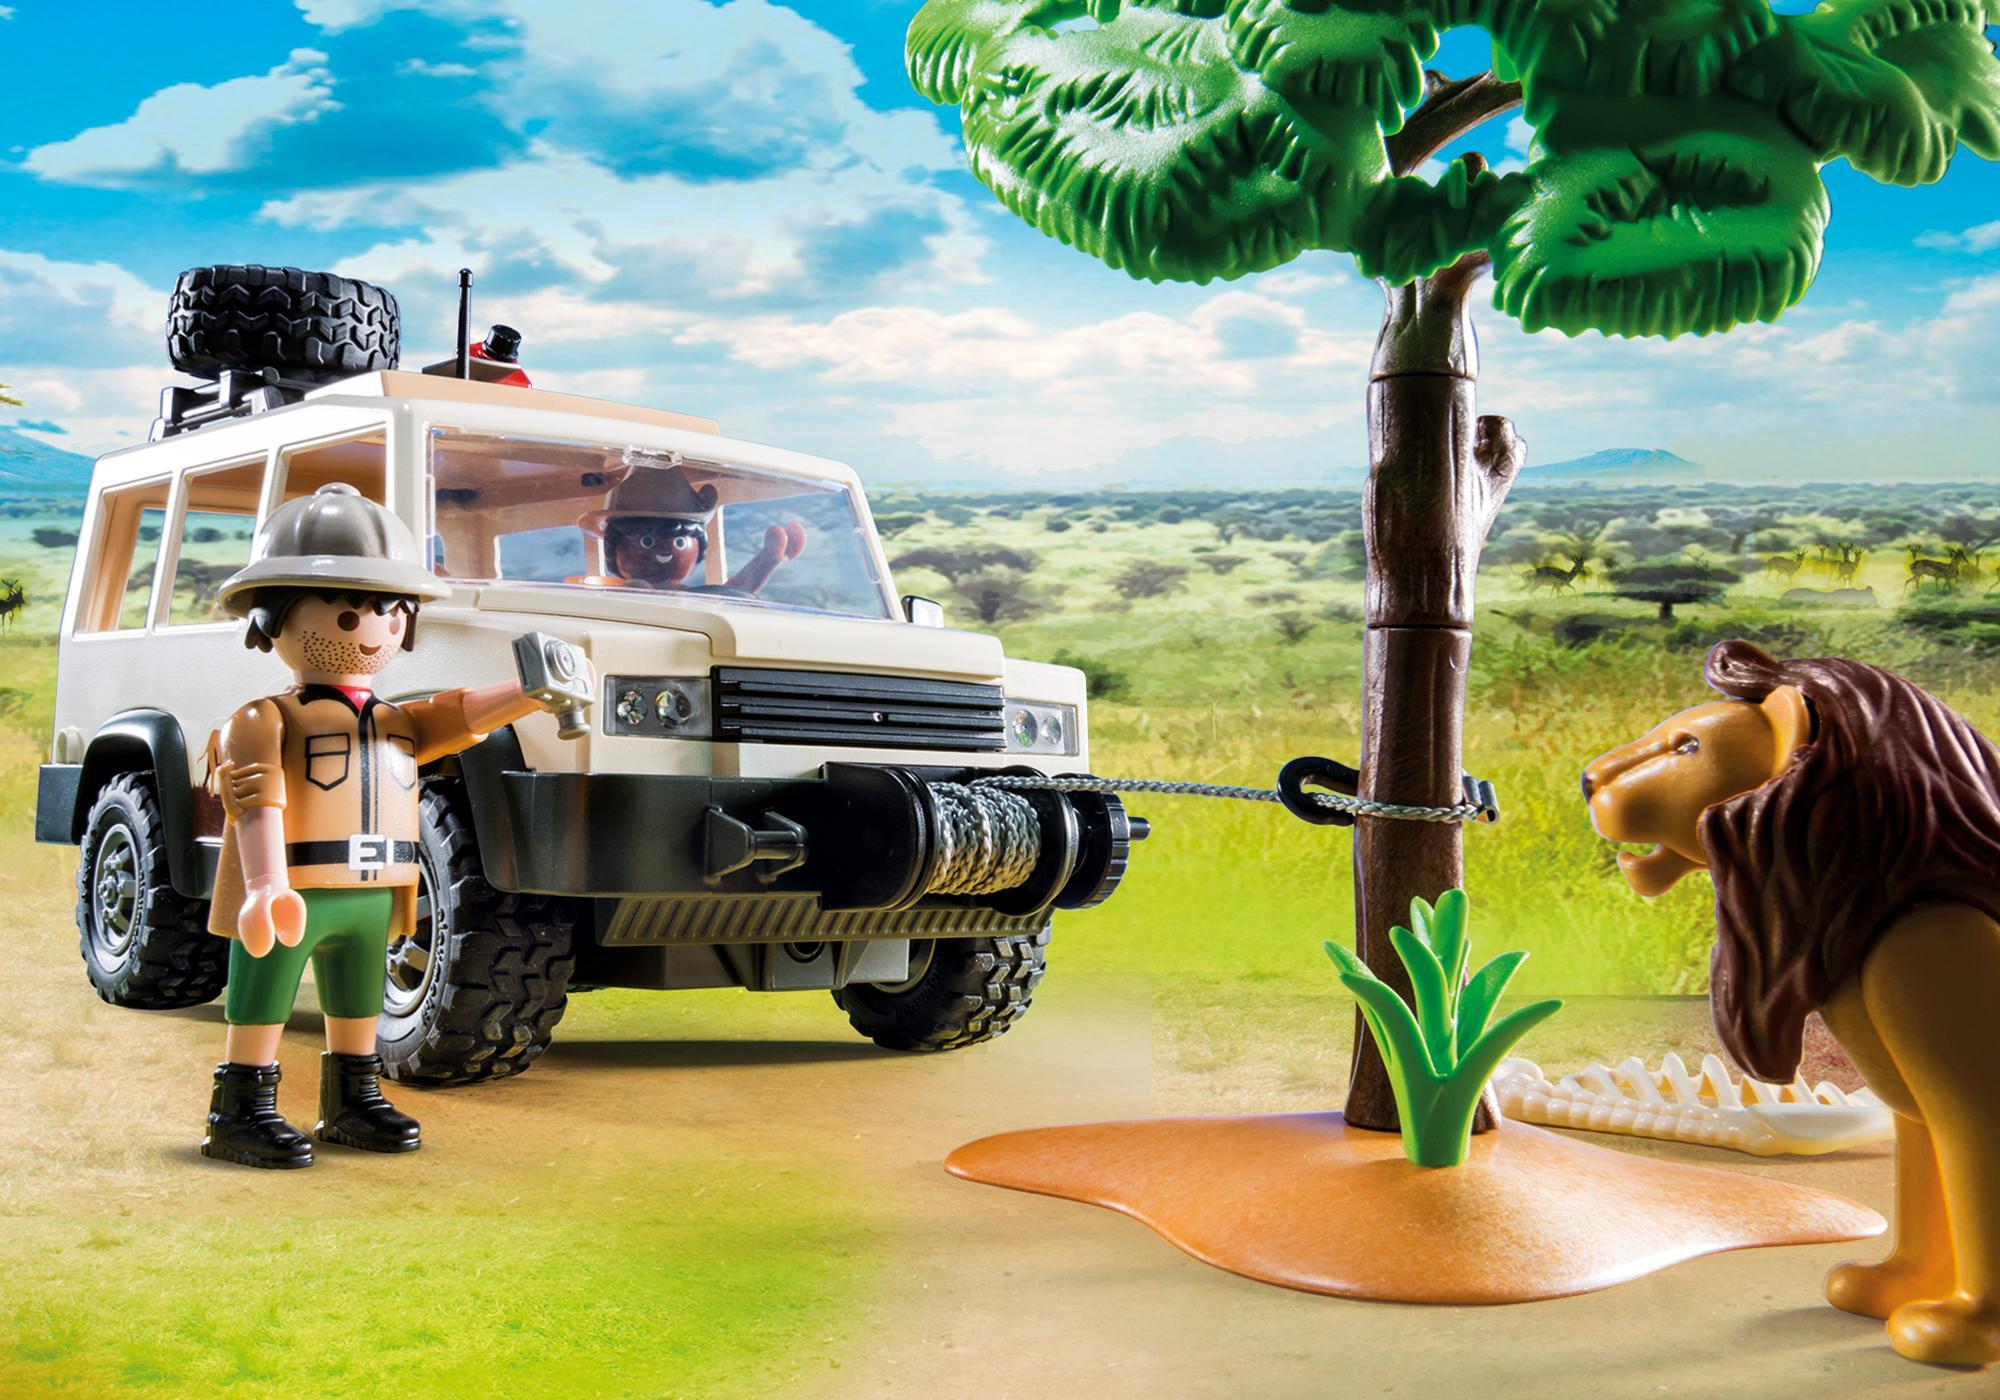 http://media.playmobil.com/i/playmobil/6798_product_extra1